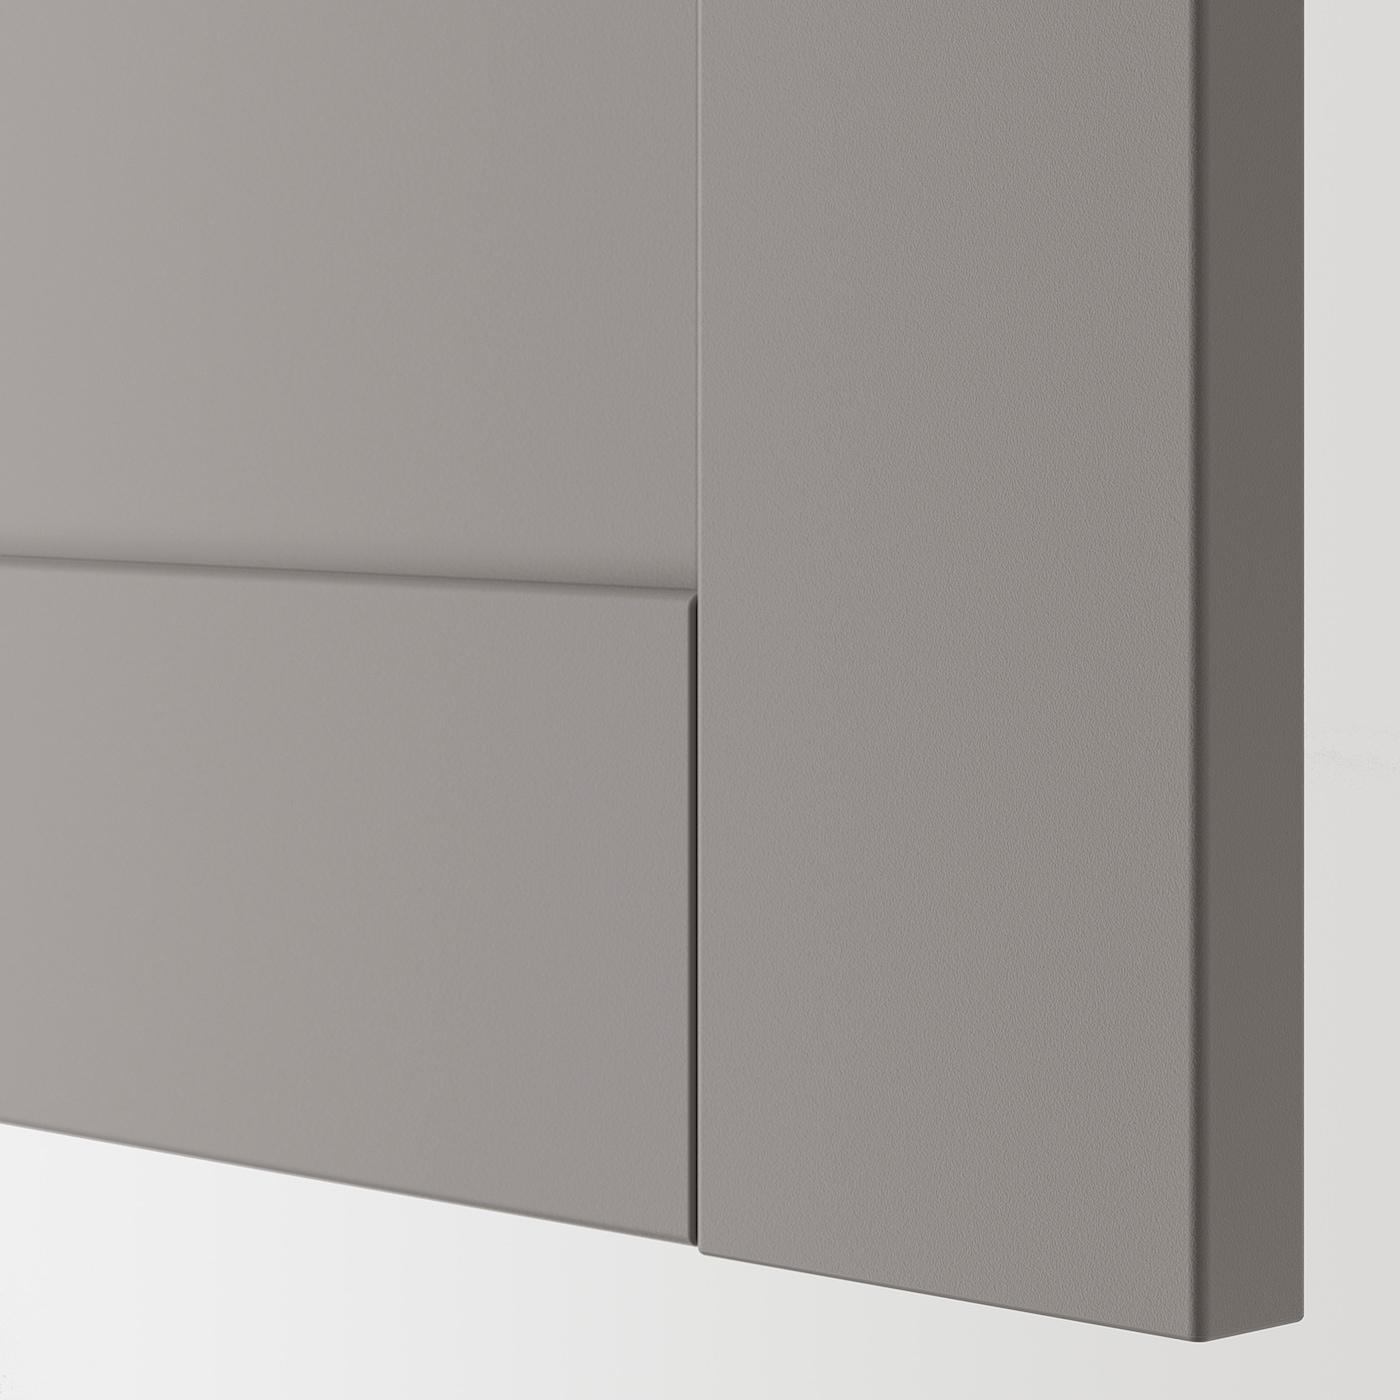 ENHET Wall cb w 2 shlvs/door, white/grey frame, 40x32x75 cm